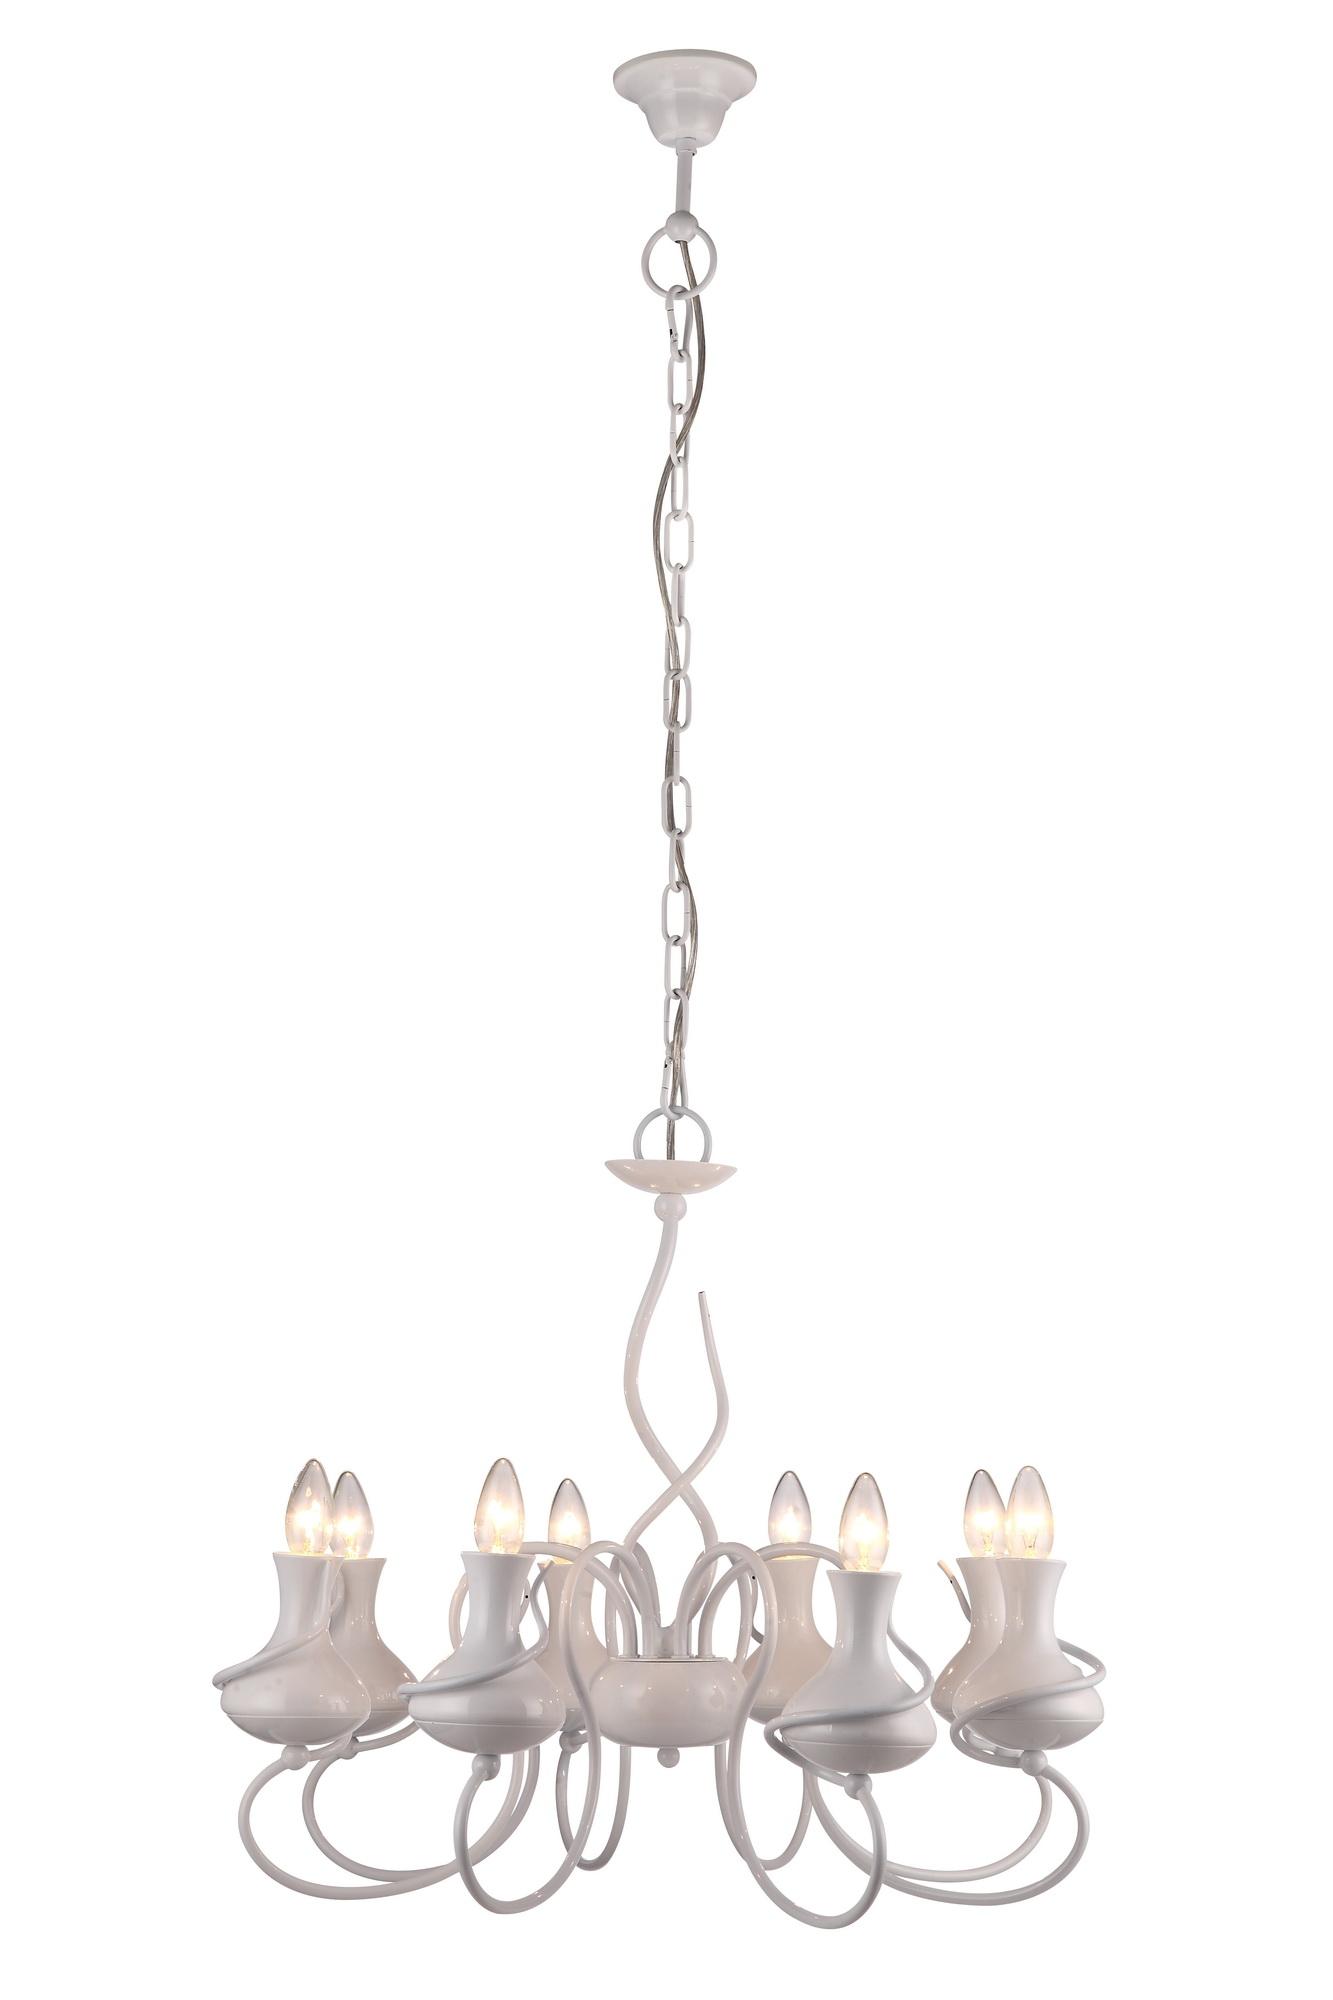 Люстра Arte lamp Vaso a6819lm-8wh arte lamp vaso a6819lm 8wh